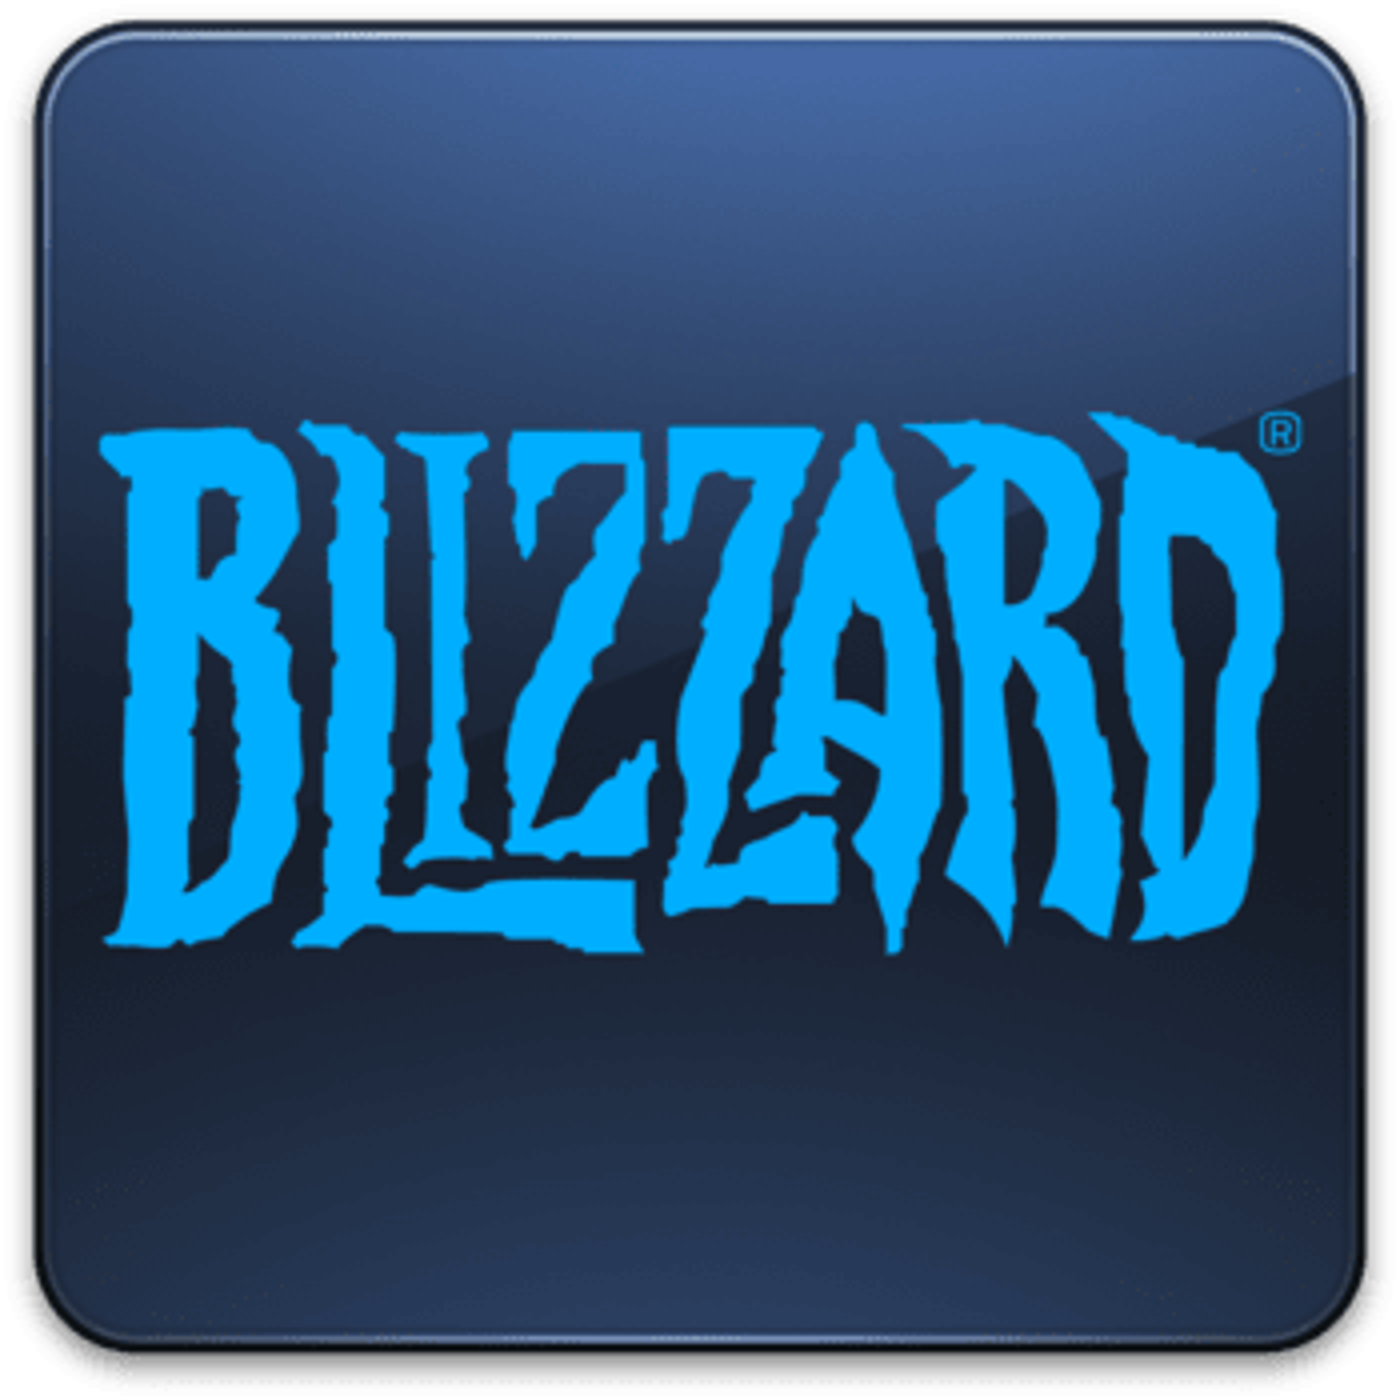 Blizzard desktop app